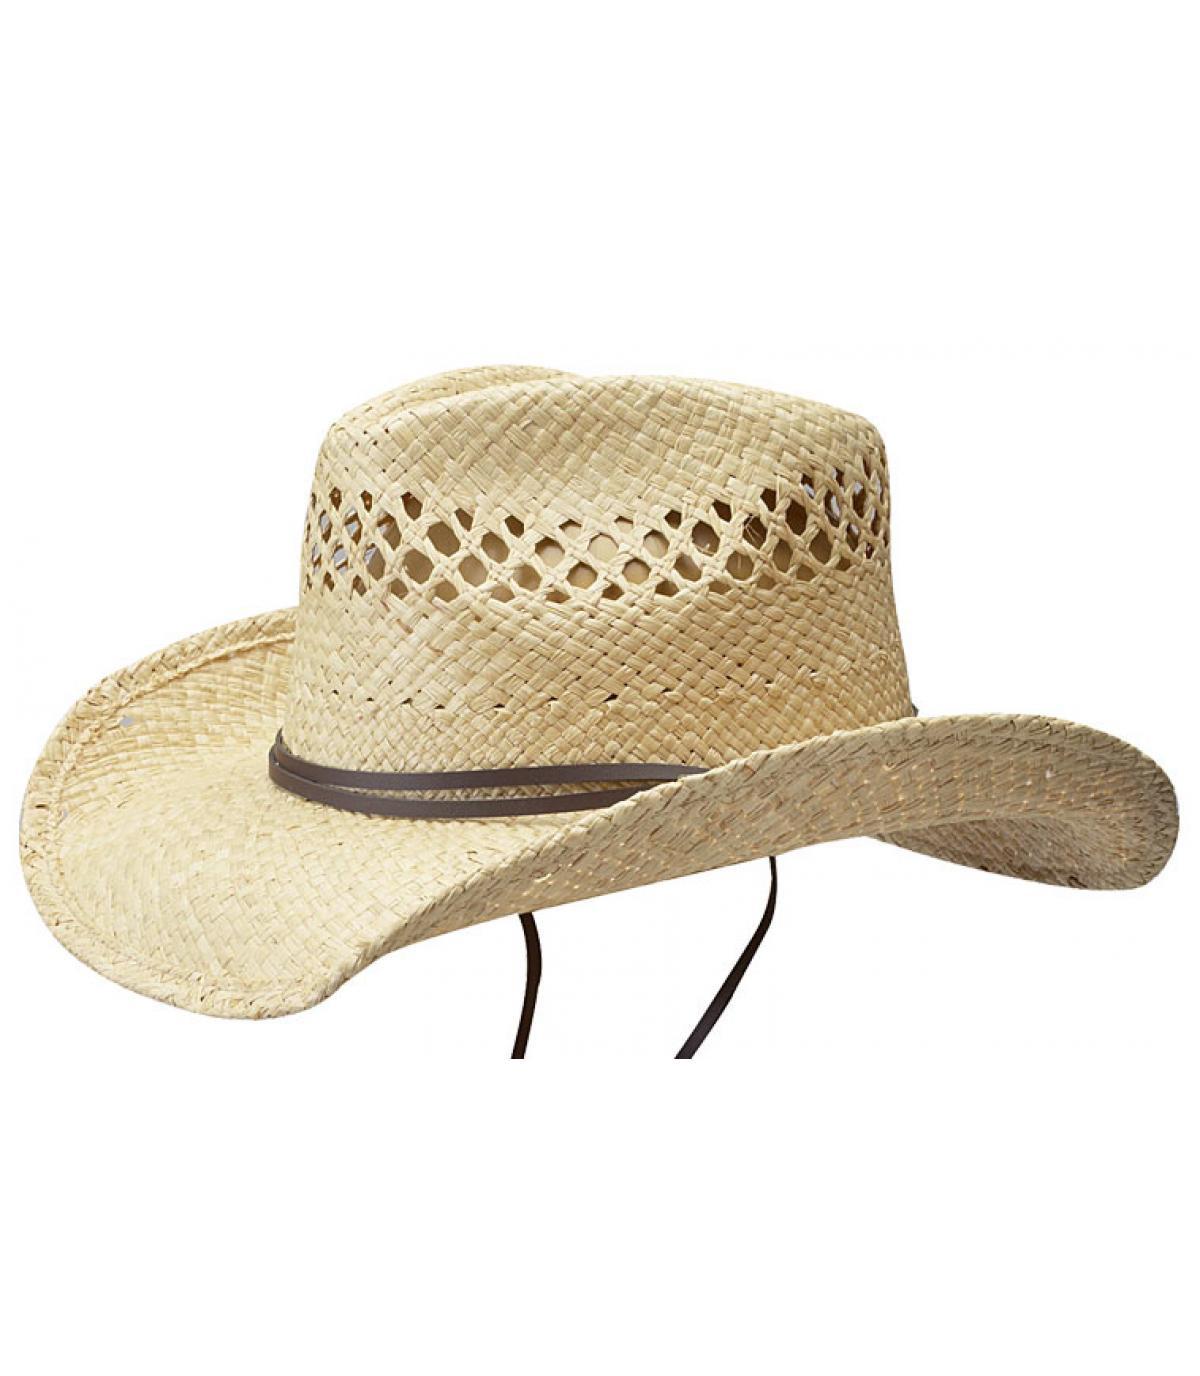 Stetson Damen Cowboy Hut